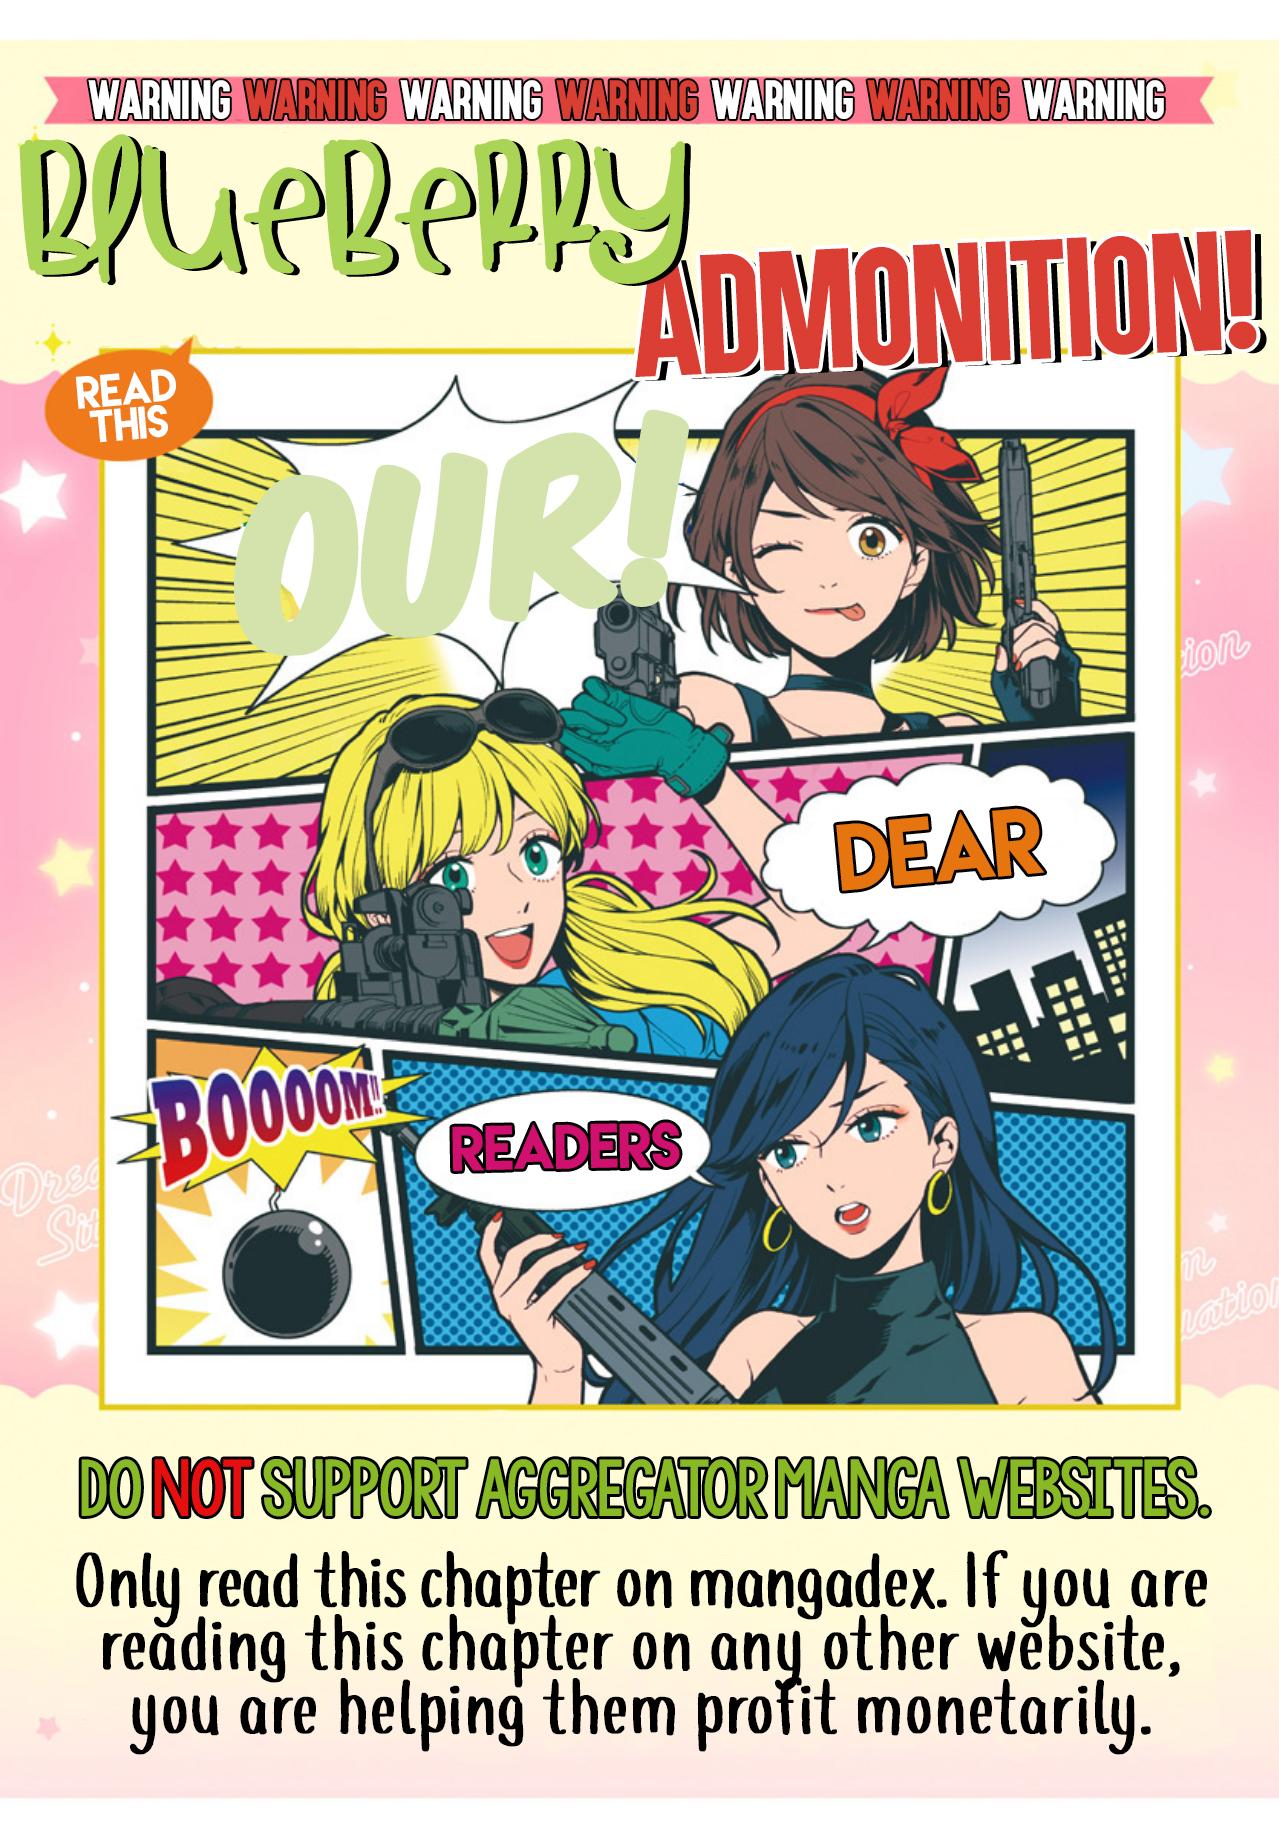 https://img2.nineanime.com/comics/pic4/9/19593/2202488/fc76a7ef0ec124e3eca50570ec388823.jpg Page 1